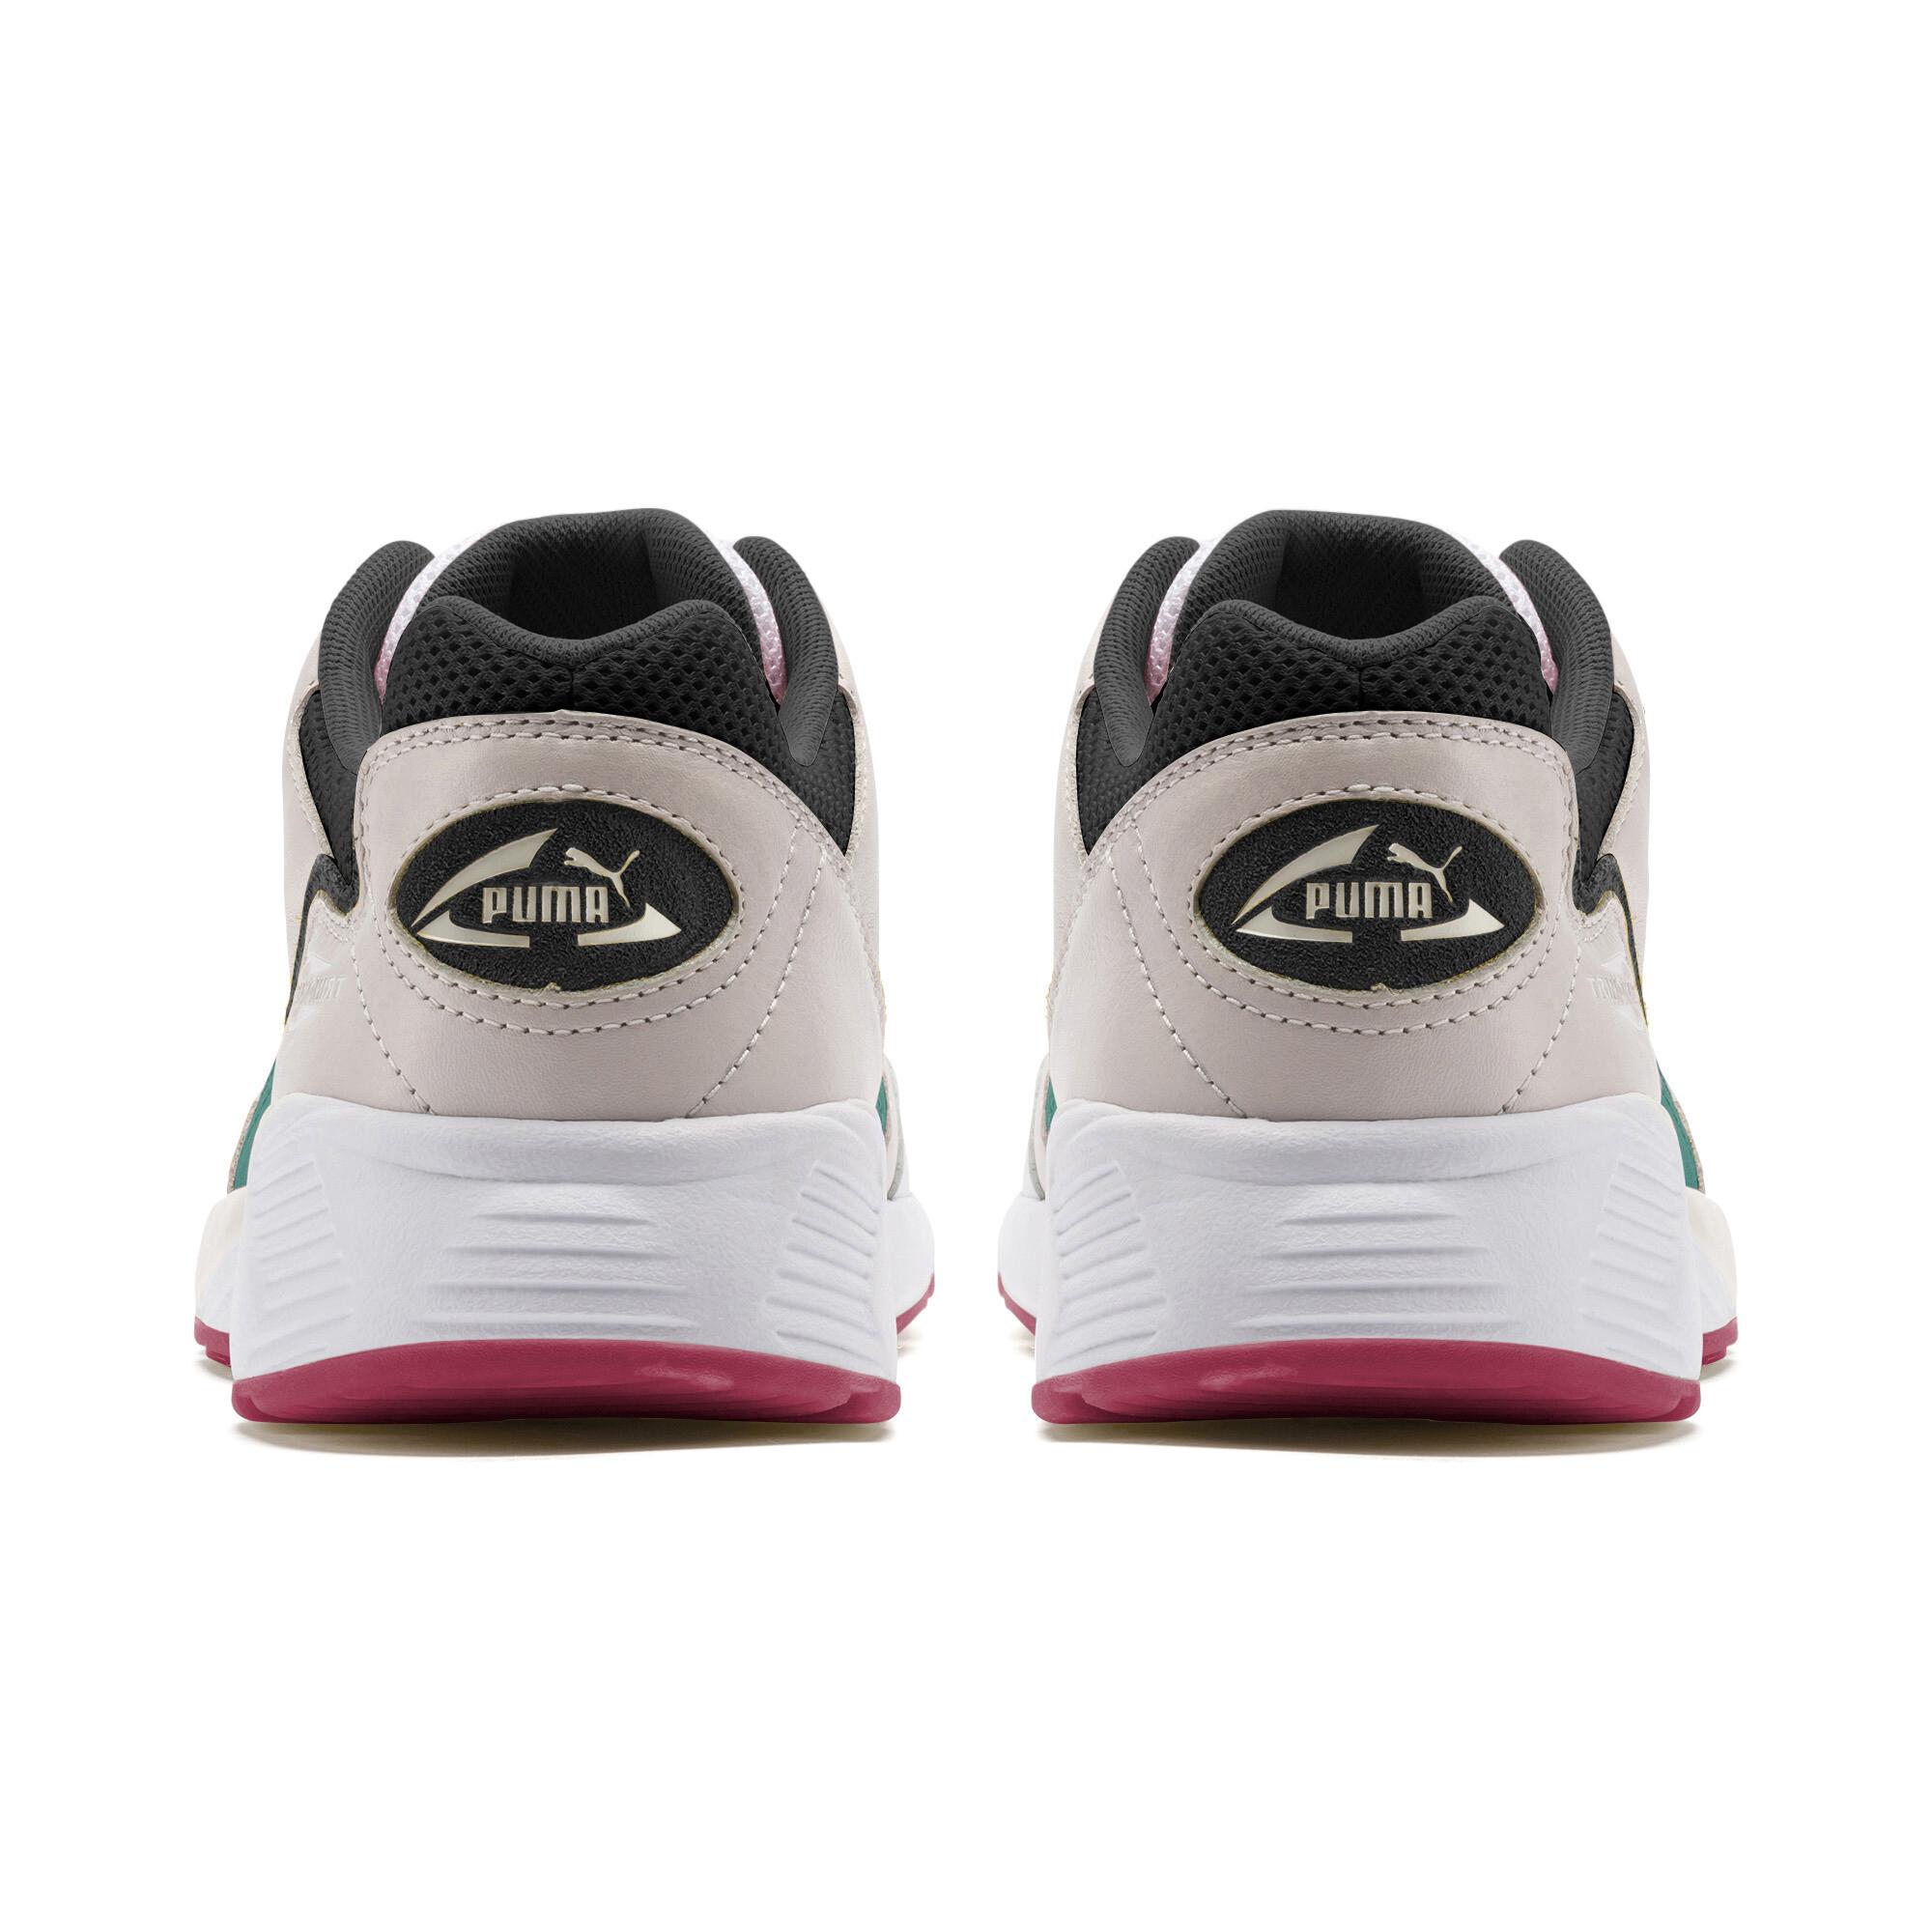 PUMA-Prevail-Classic-Sneakers-Unisex-Shoe thumbnail 9